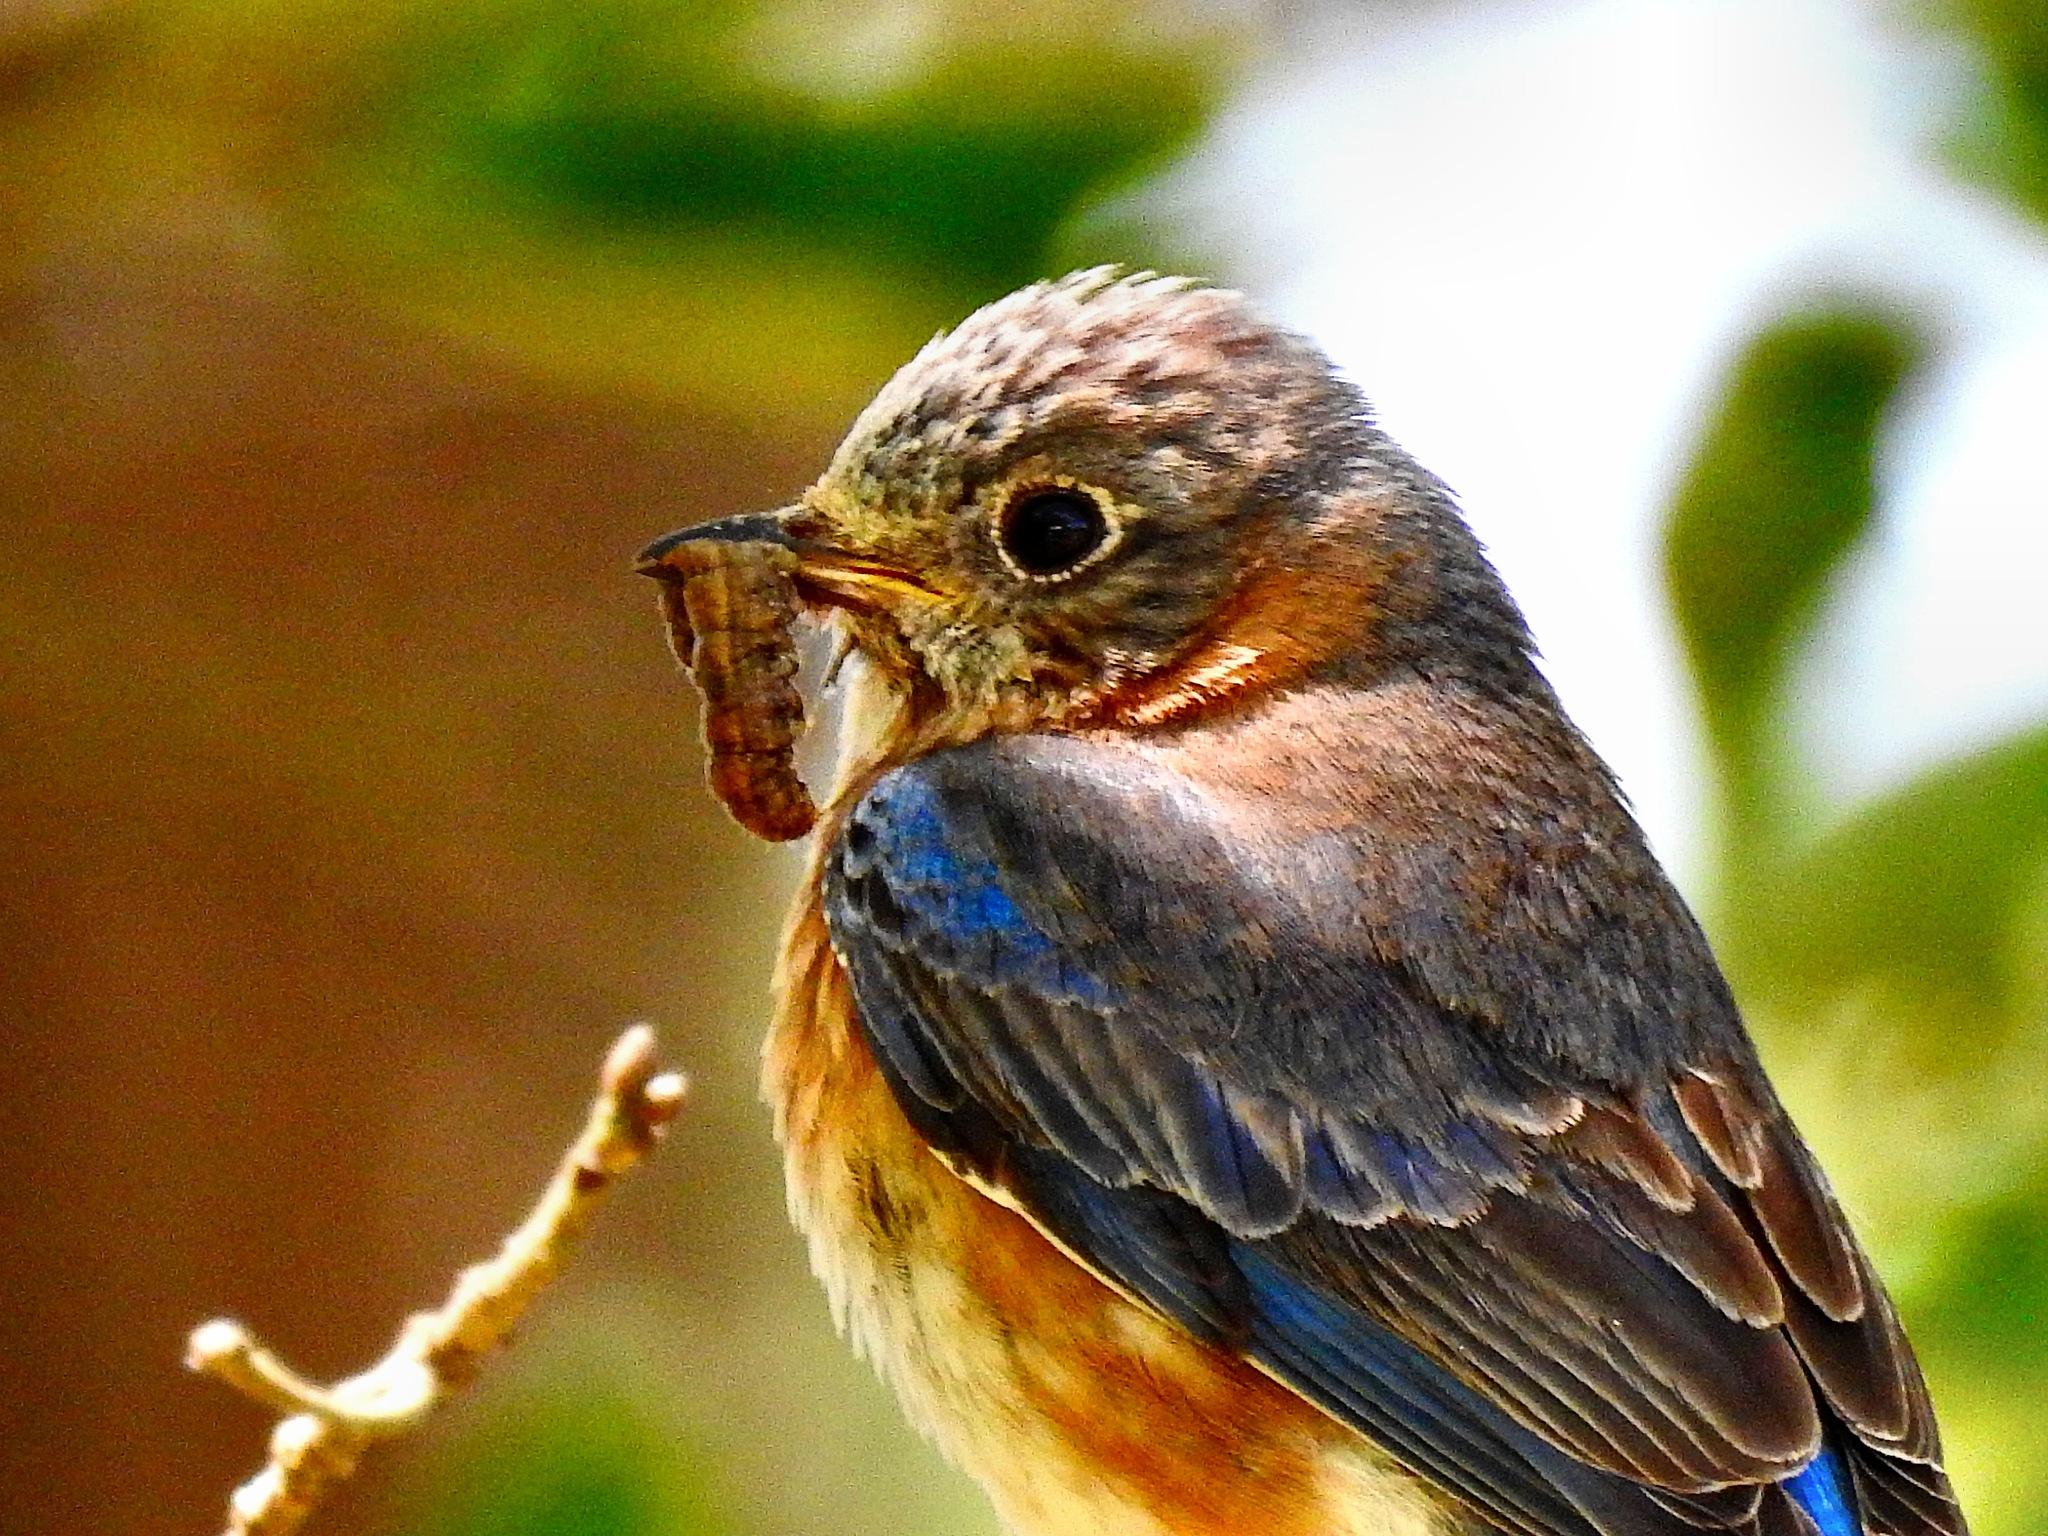 Mama Bluebird by Patty Stockton